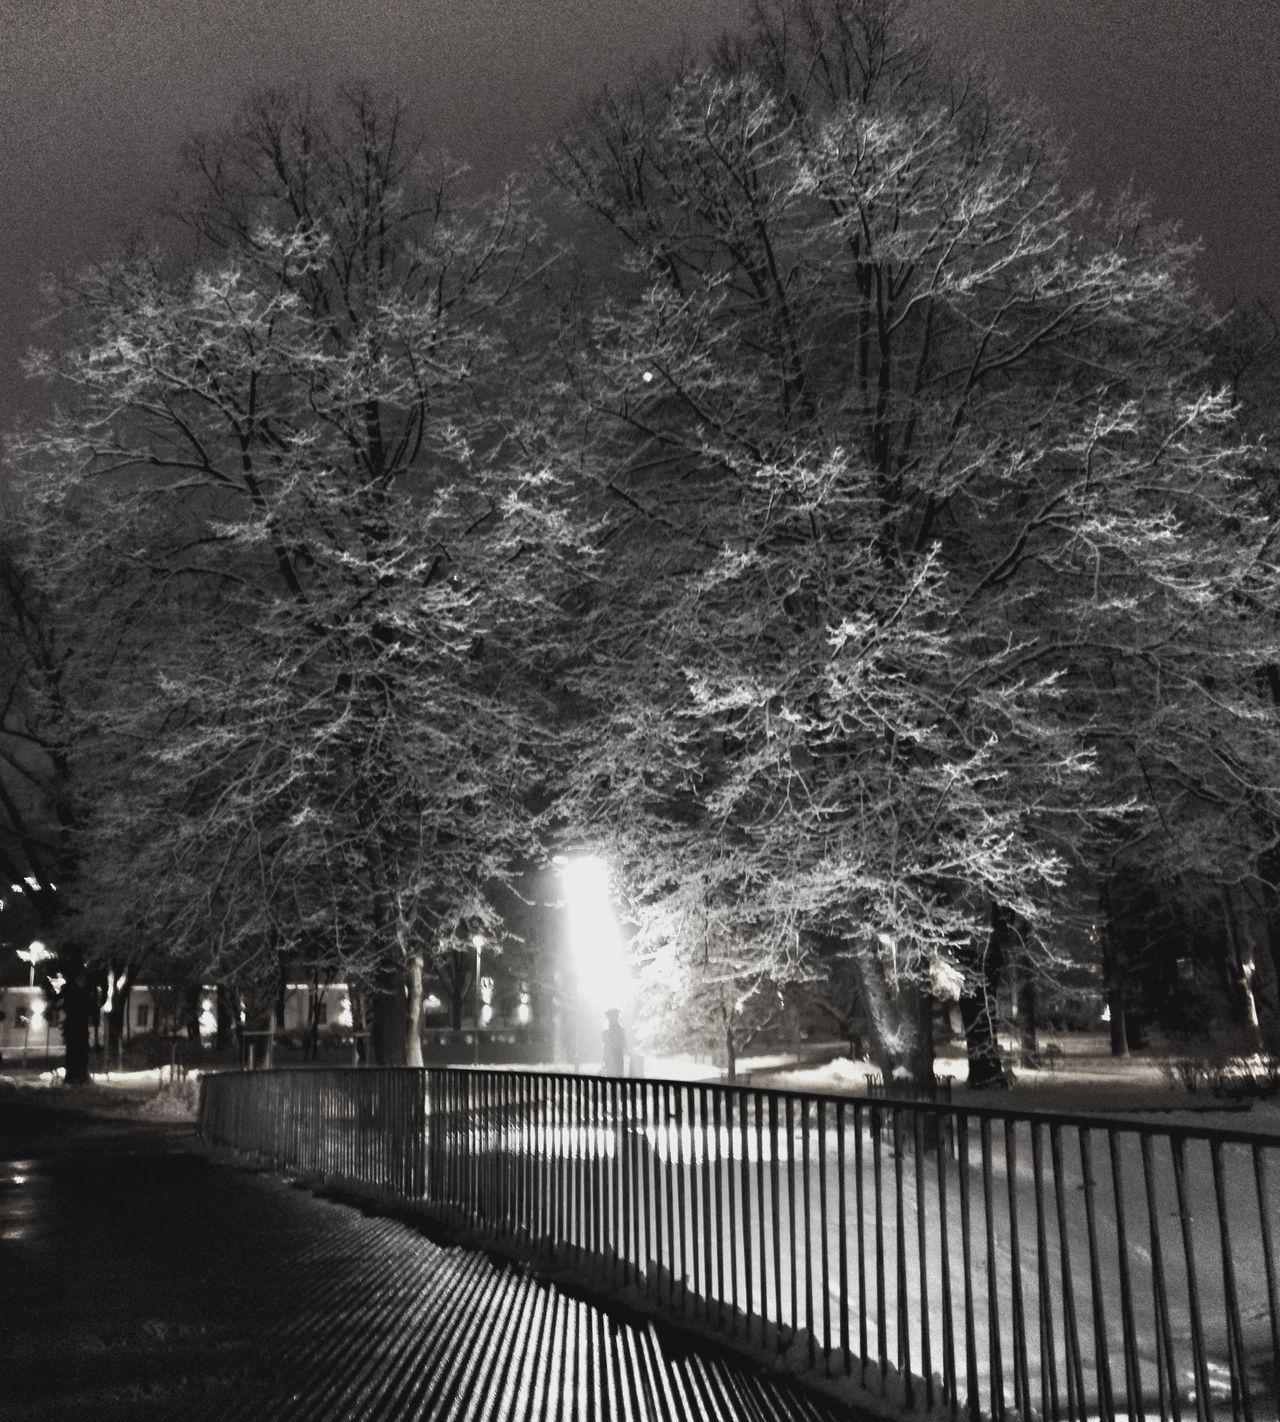 Tree City Night Illuminated Weather Cold Temperature Hello World Snow Enjoying Life Black And White Winter Tranquility